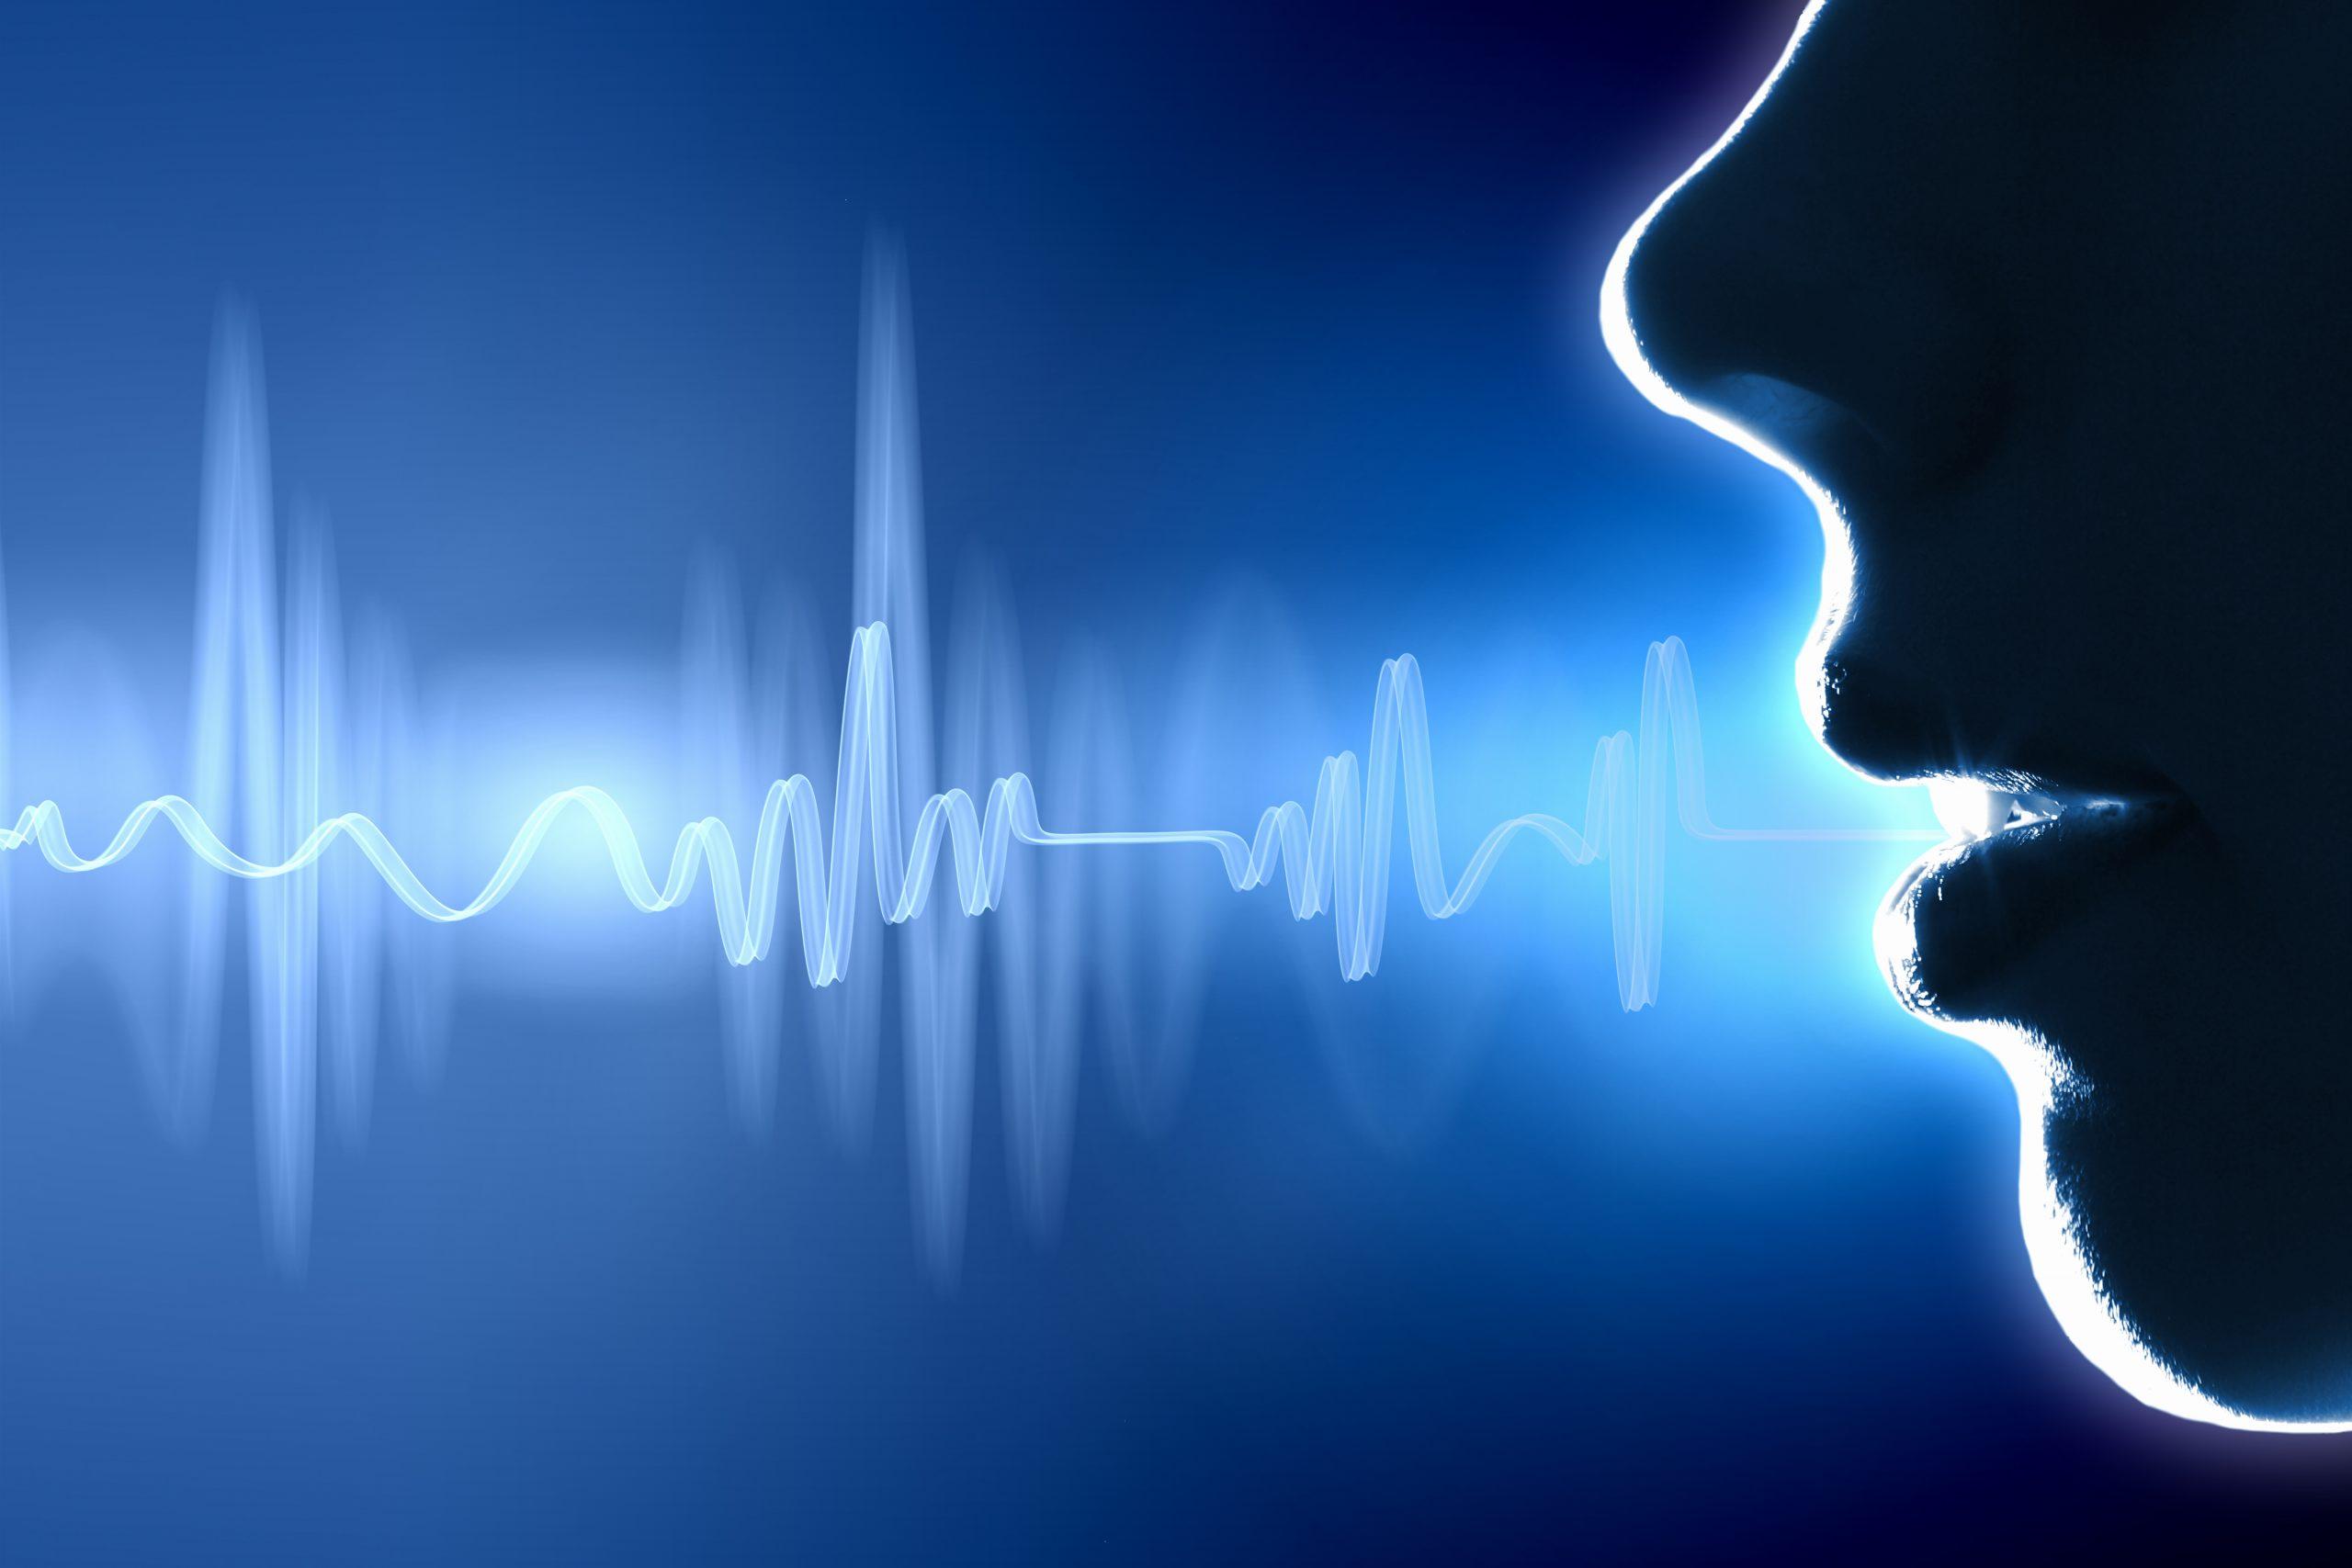 deepfake - https://depositphotos.com/16361363/stock-photo-sound-wave-illustration.html